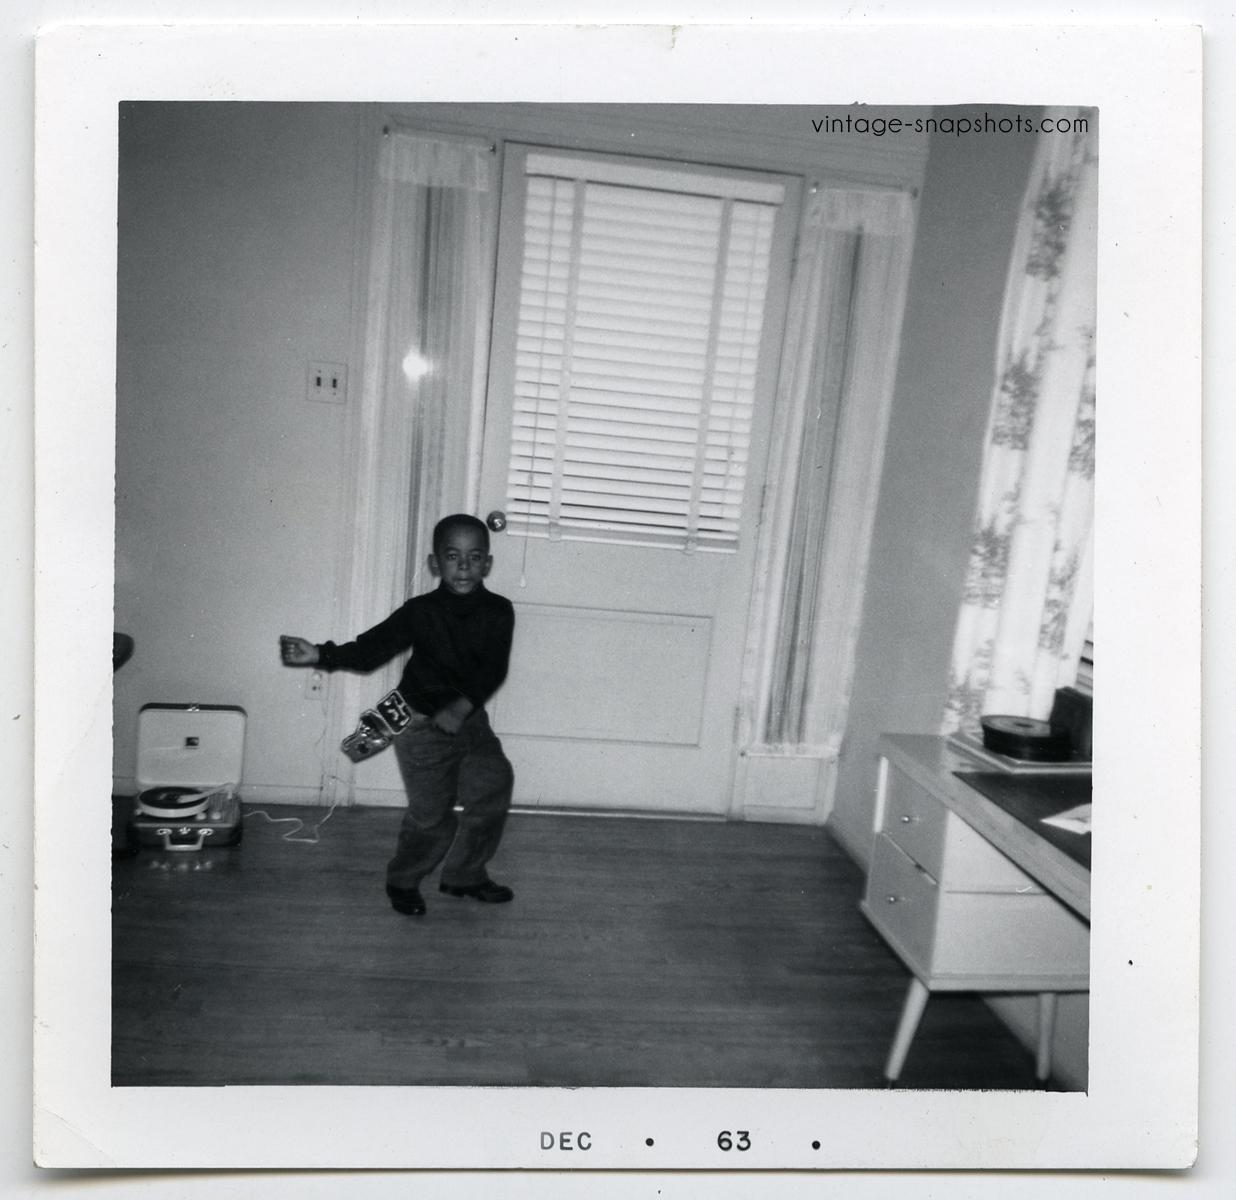 1963 vintage snapshot photograph of black boy dancing to record player while wearing toy gun